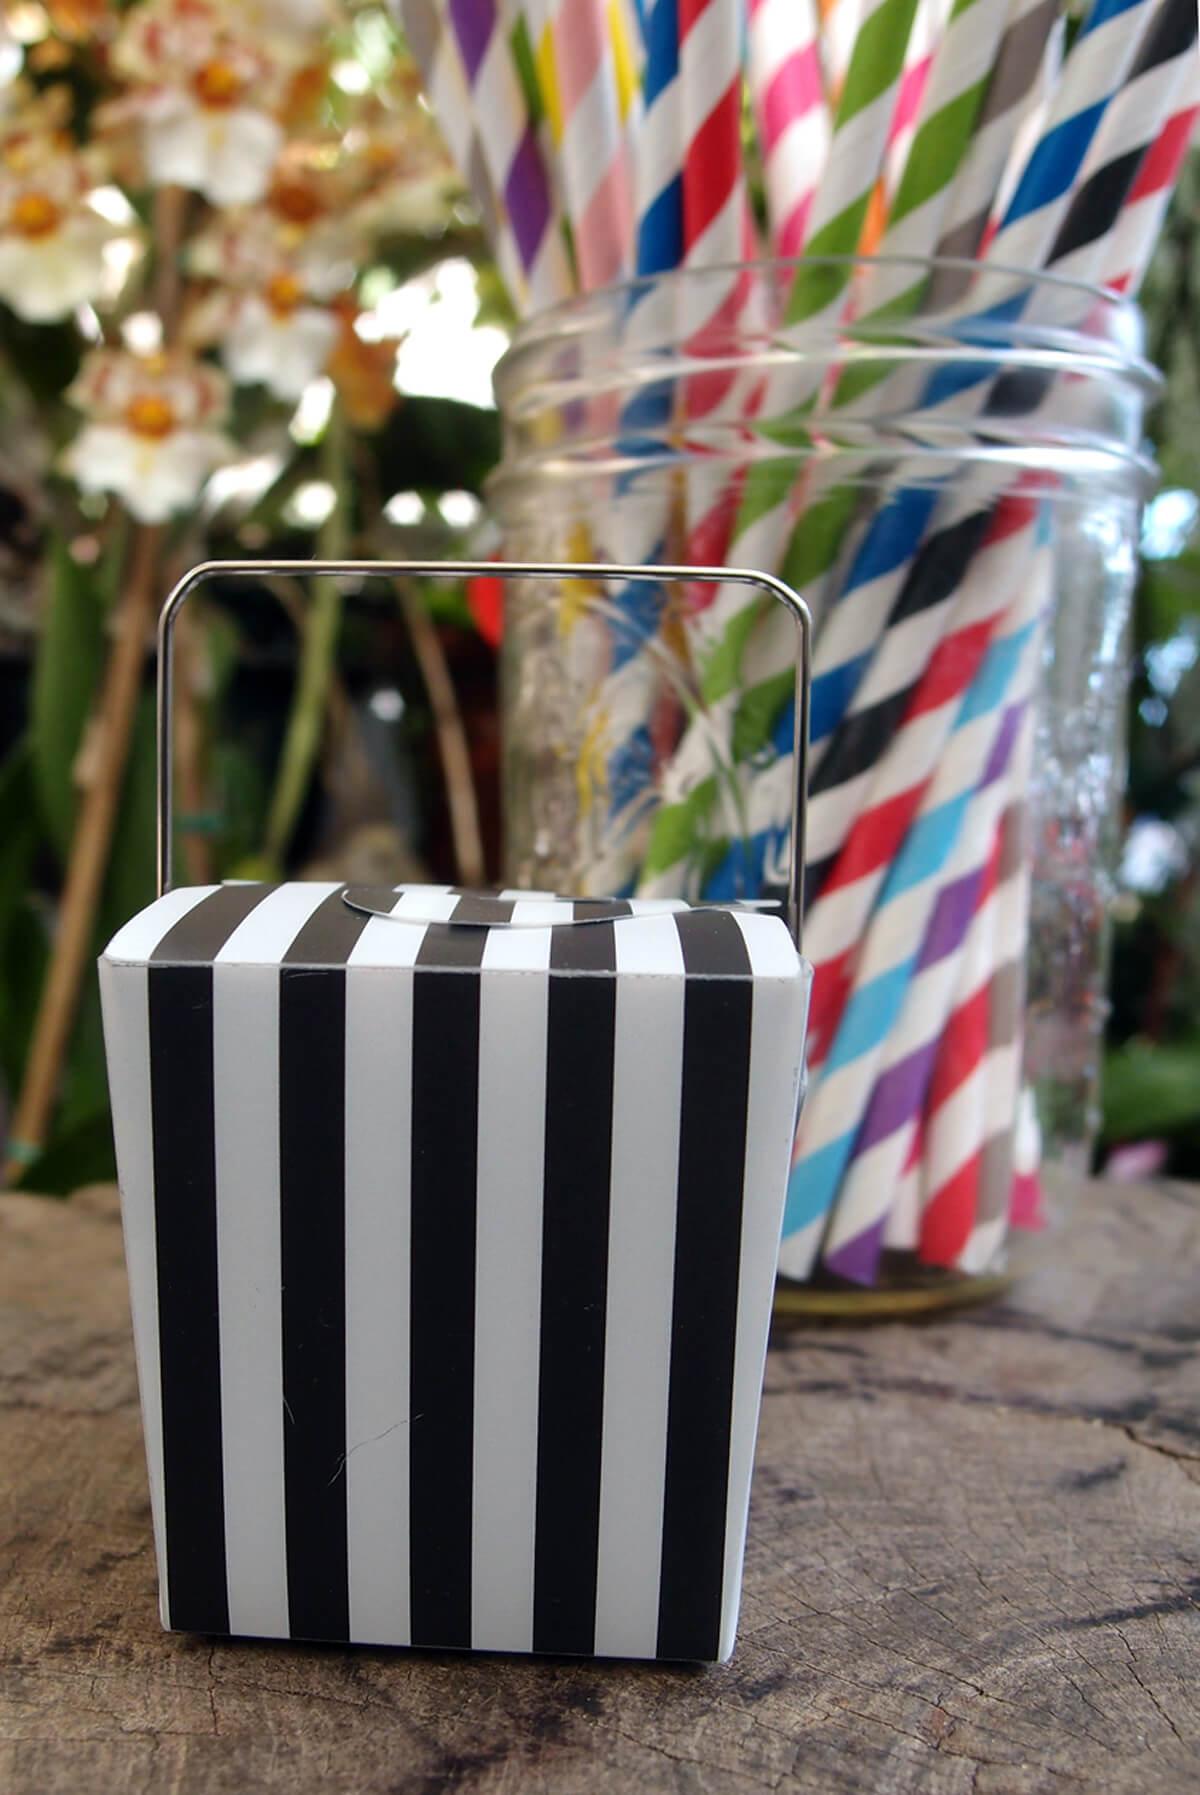 12 Mini Black Amp White Striped Takeout Boxes 2 12 Boxes